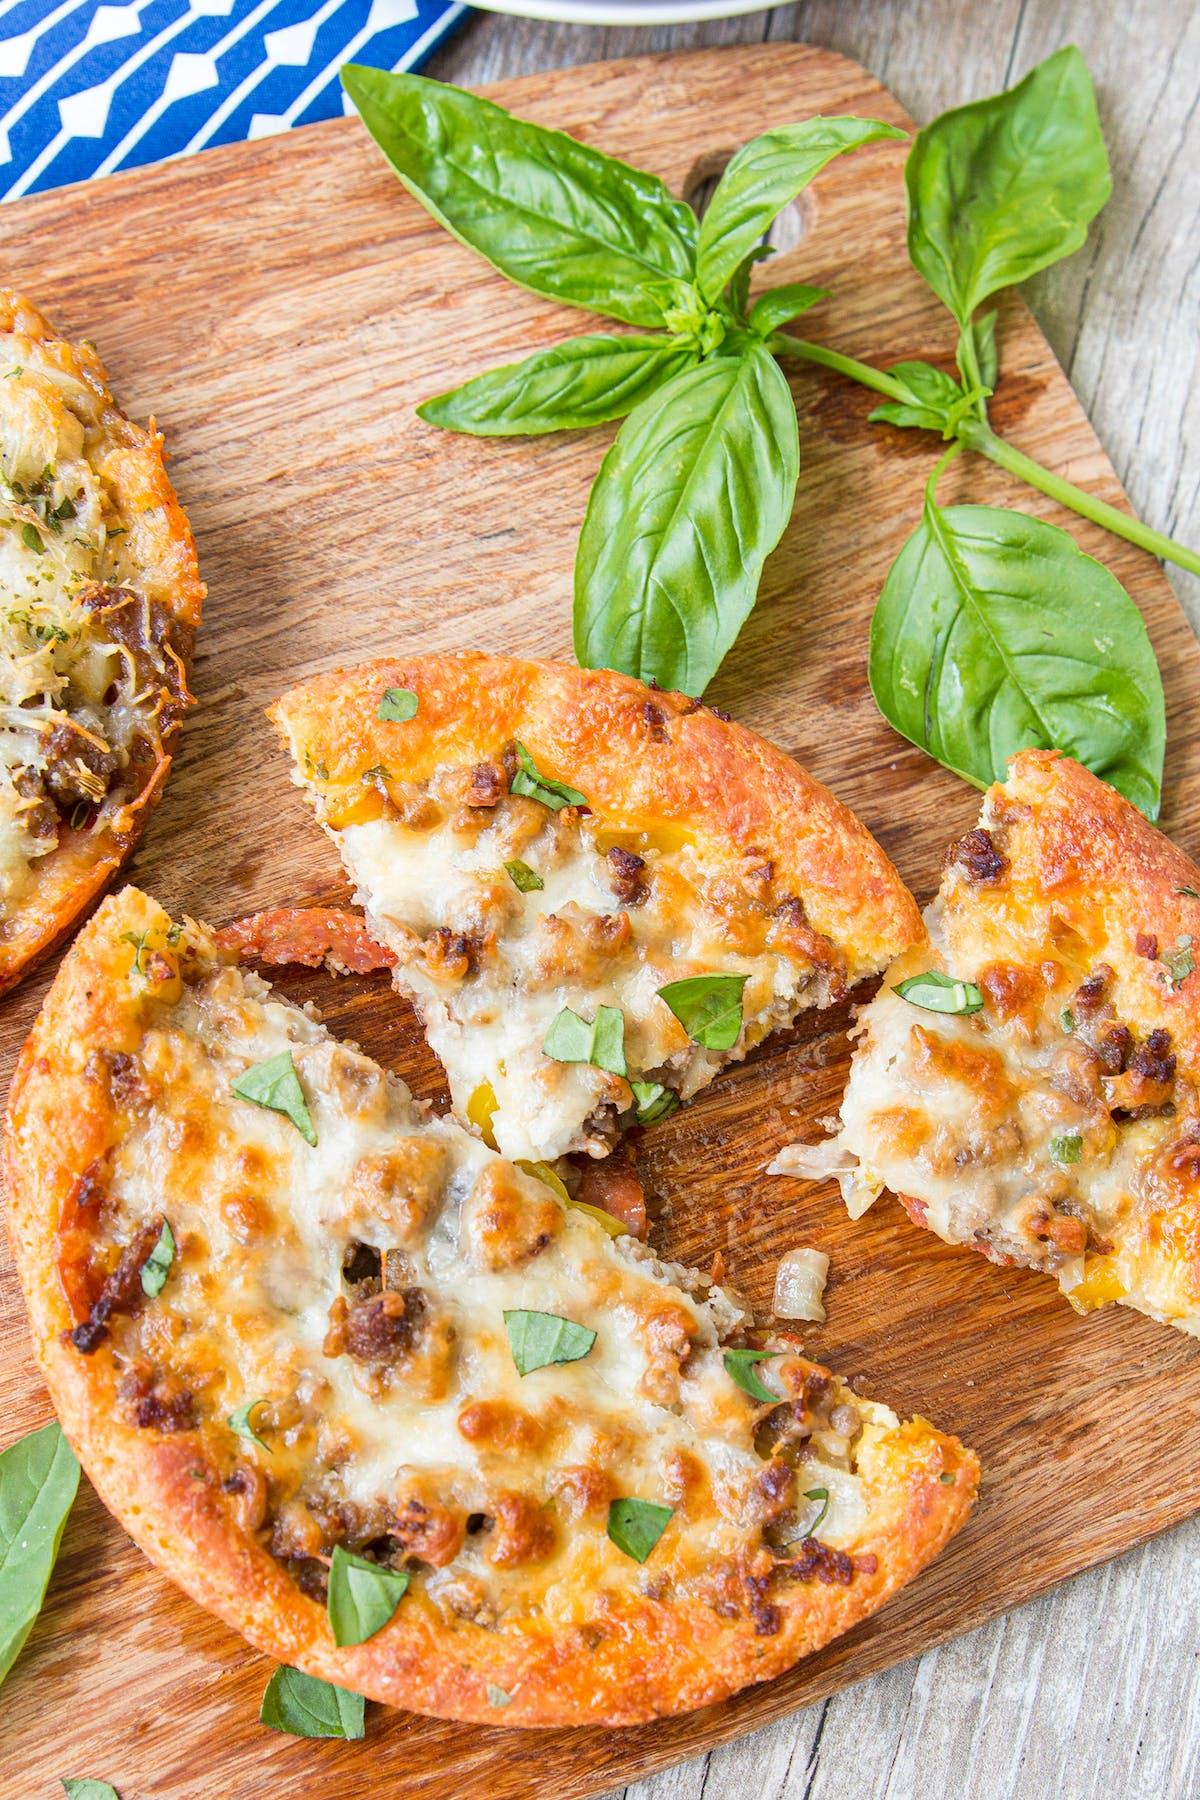 Pizza honda low-carb al estilo Chicago